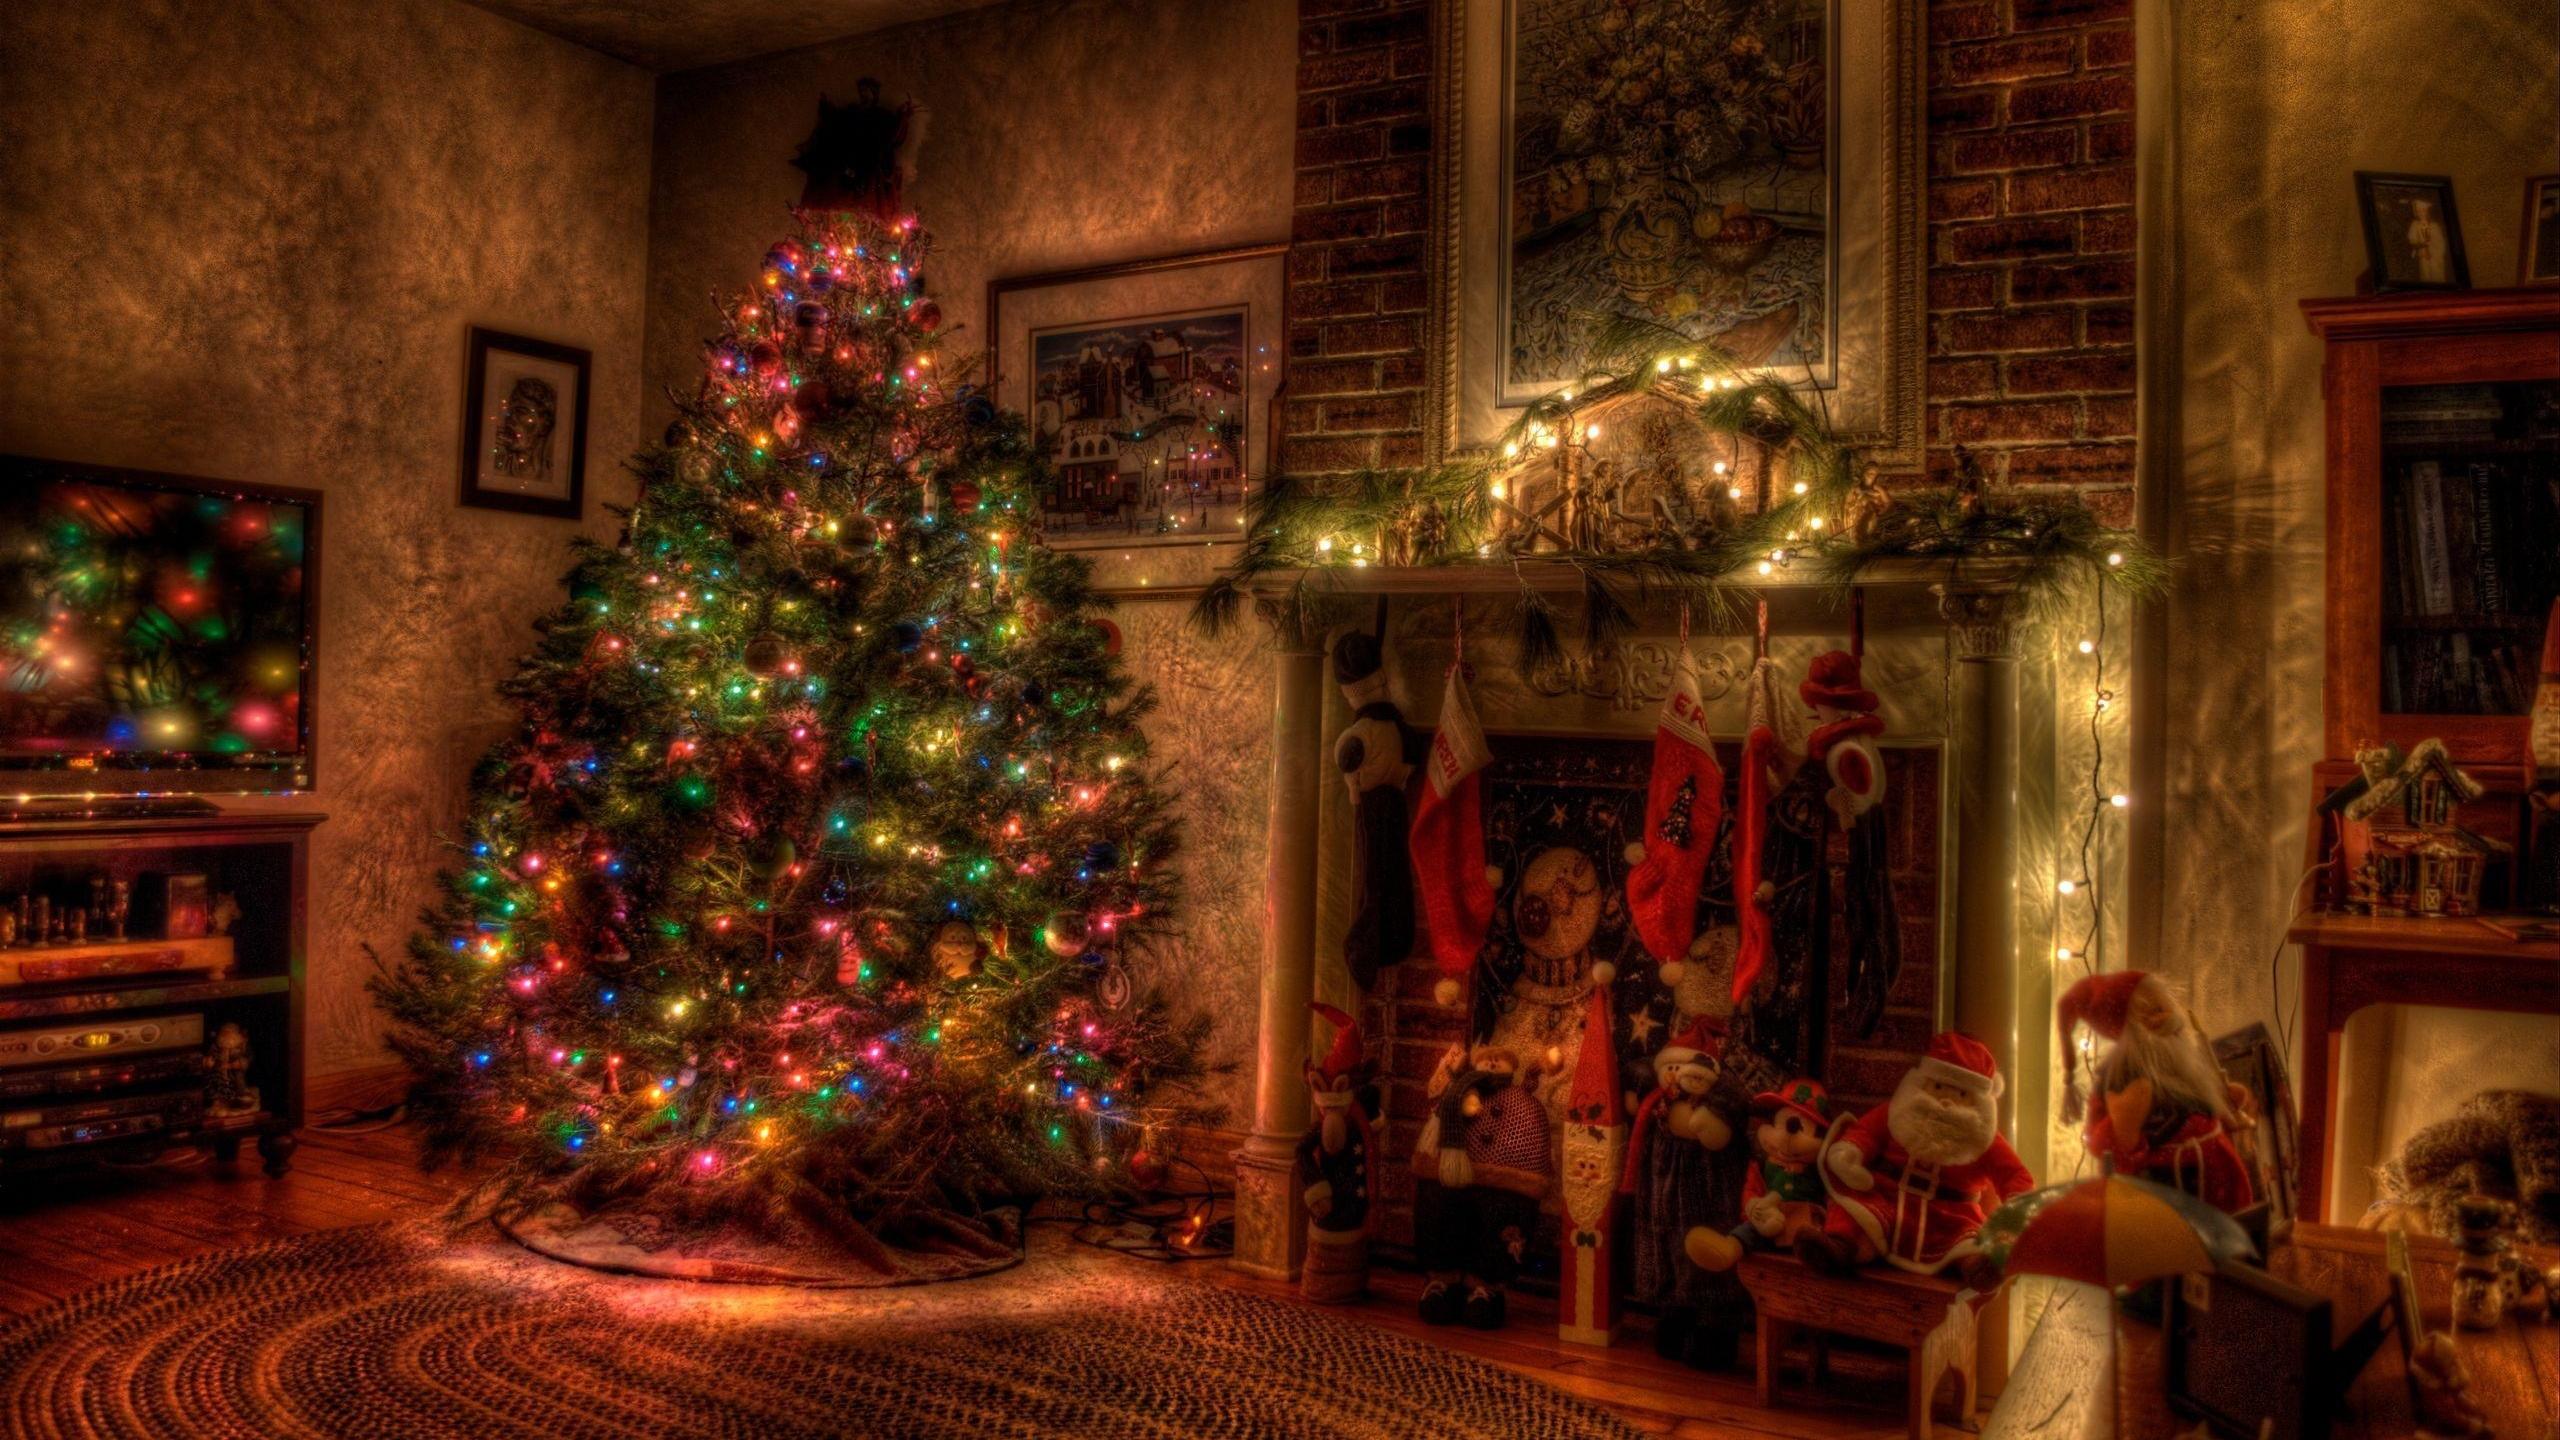 Christmas Wallpaper Fireplace Living Room myideasbedroomcom 2560x1440